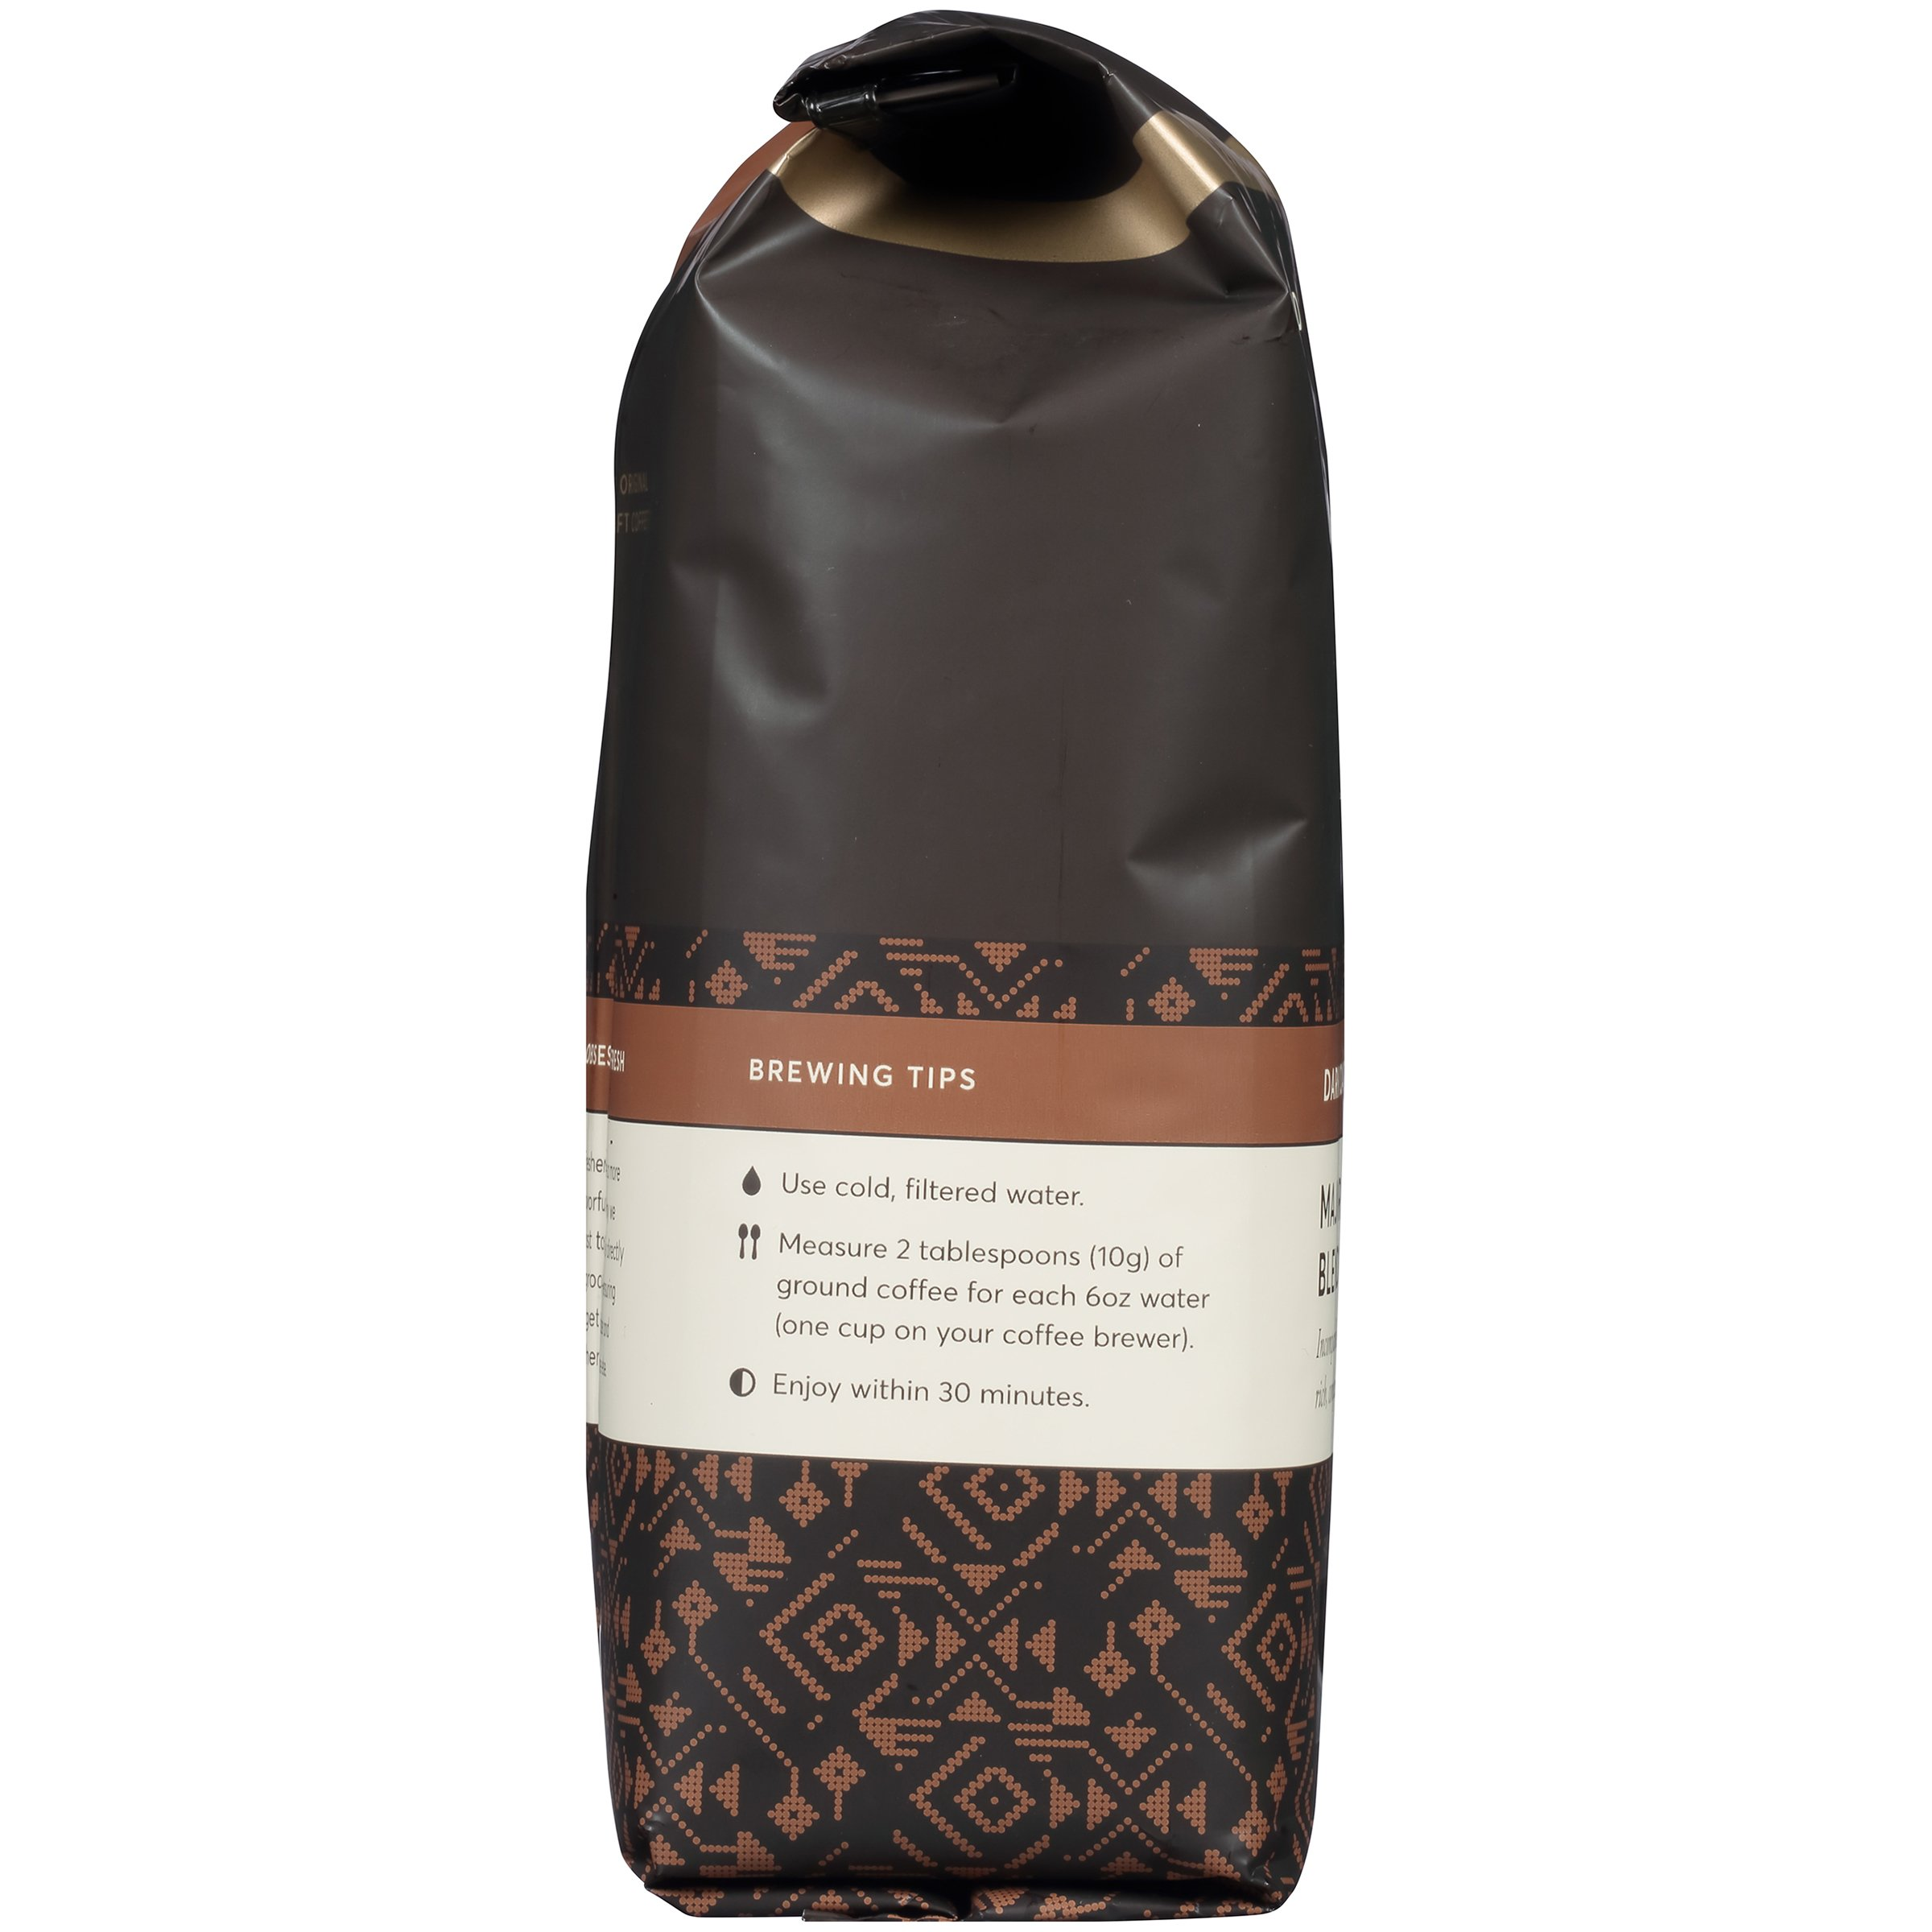 Peet's Coffee, Peetnik Pack, Major Dickason's Blend, Dark Roast, Ground Coffee, 20 oz. Bag, Rich, Smooth, and Complex Dark Roast Coffee Blend With A Full Bodied and Layered Flavor by Peet's Coffee (Image #7)